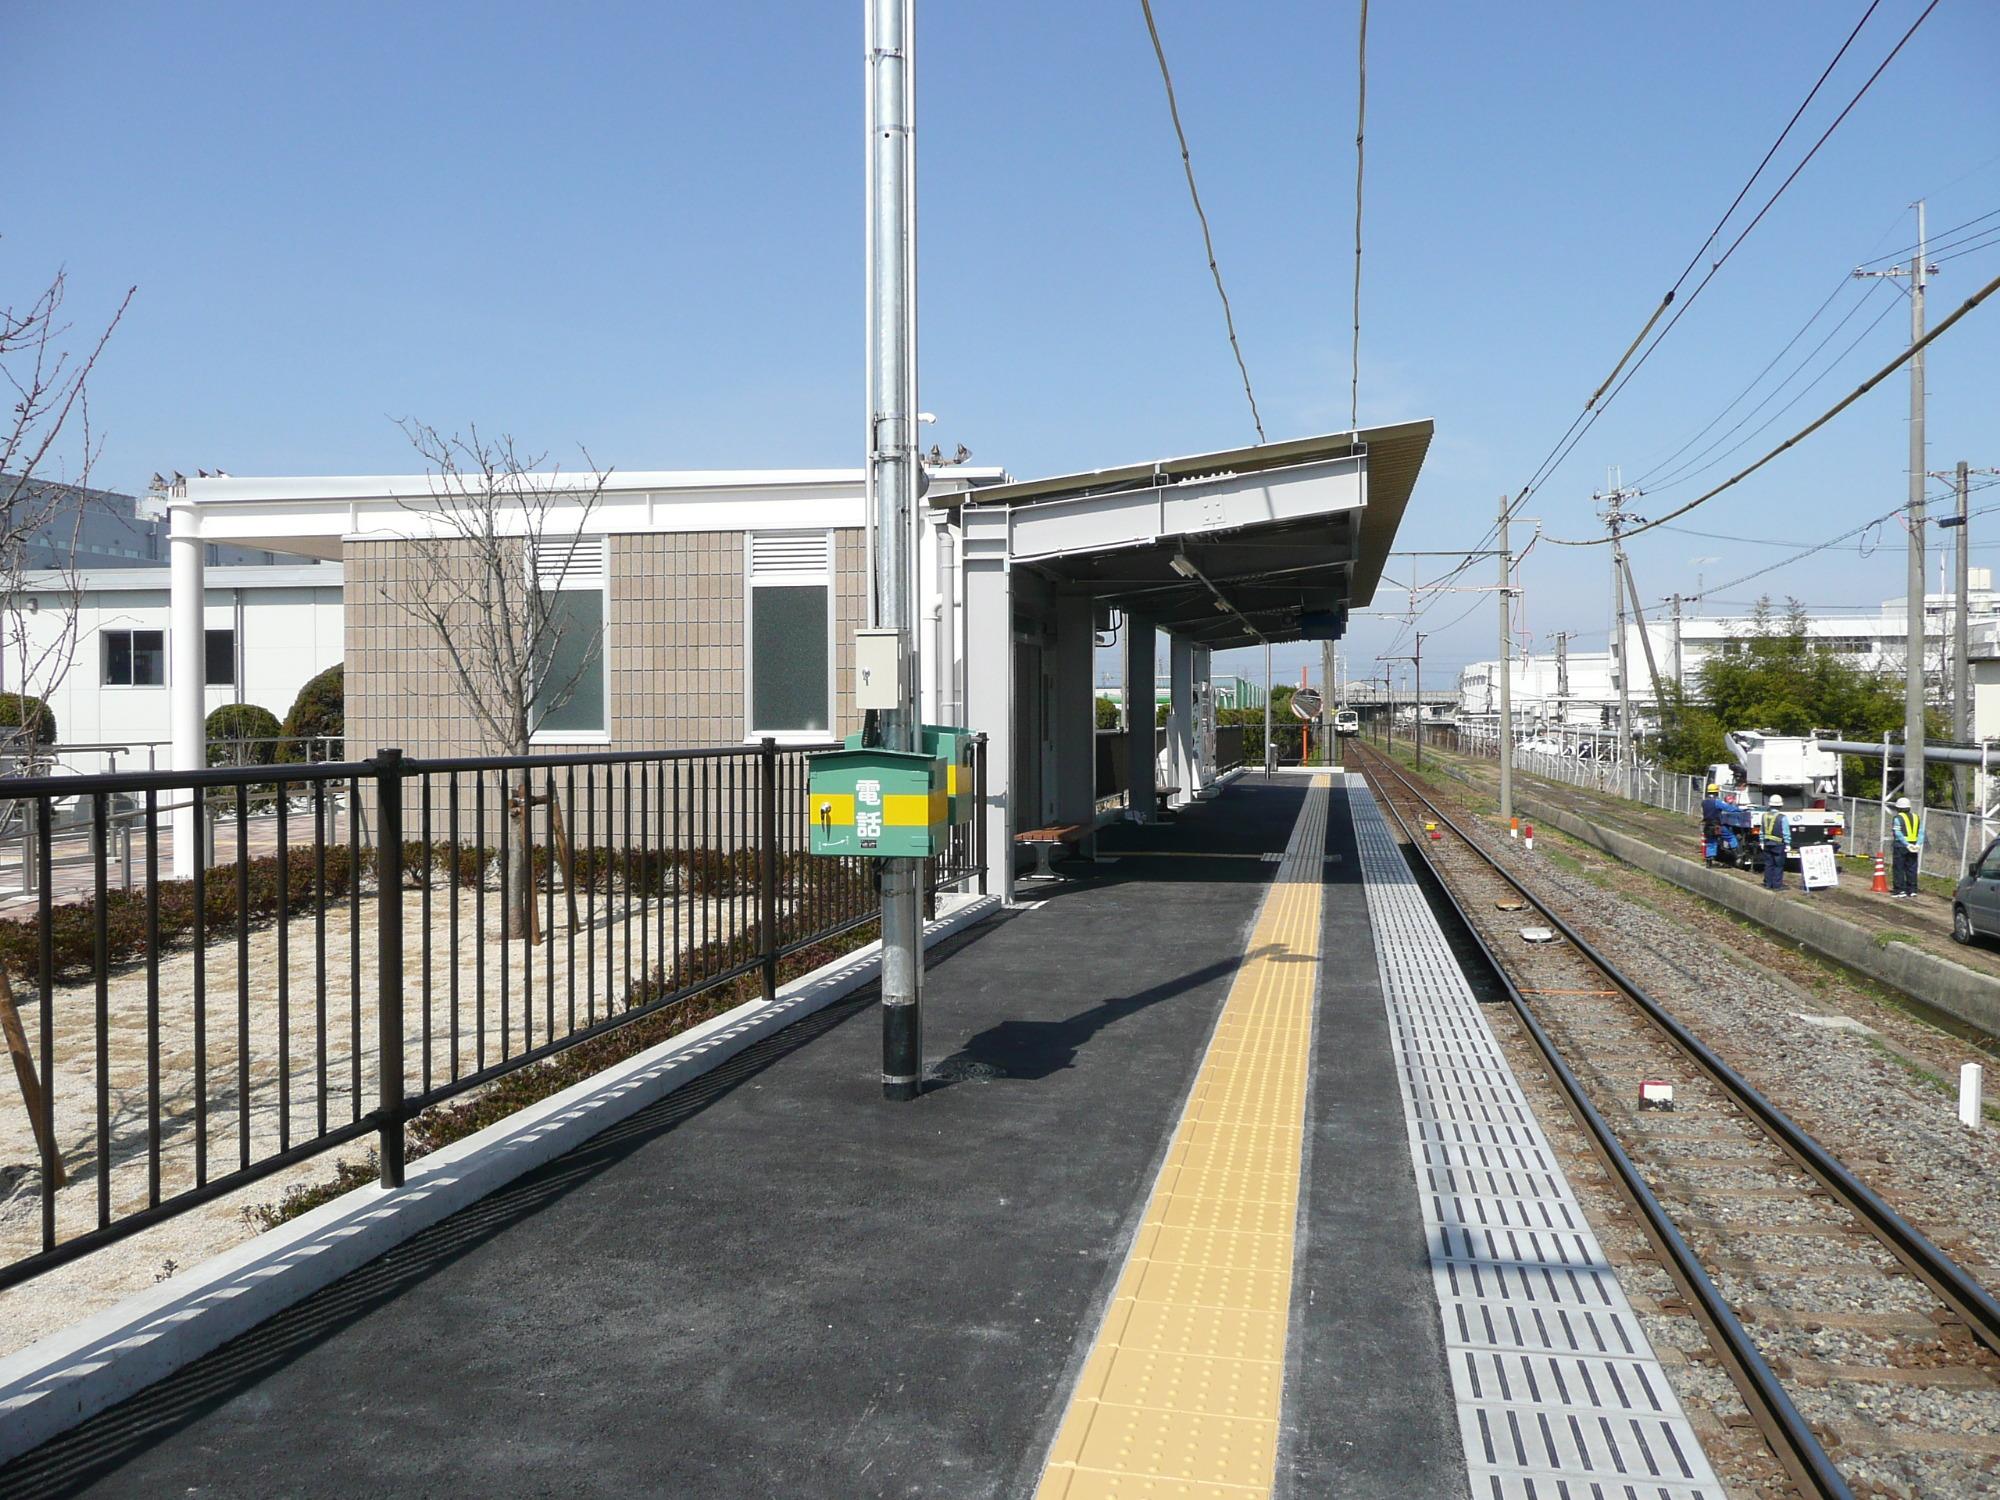 https://upload.wikimedia.org/wikipedia/commons/7/7e/OHMI_Railway_SCREEN_Station_platform.jpg